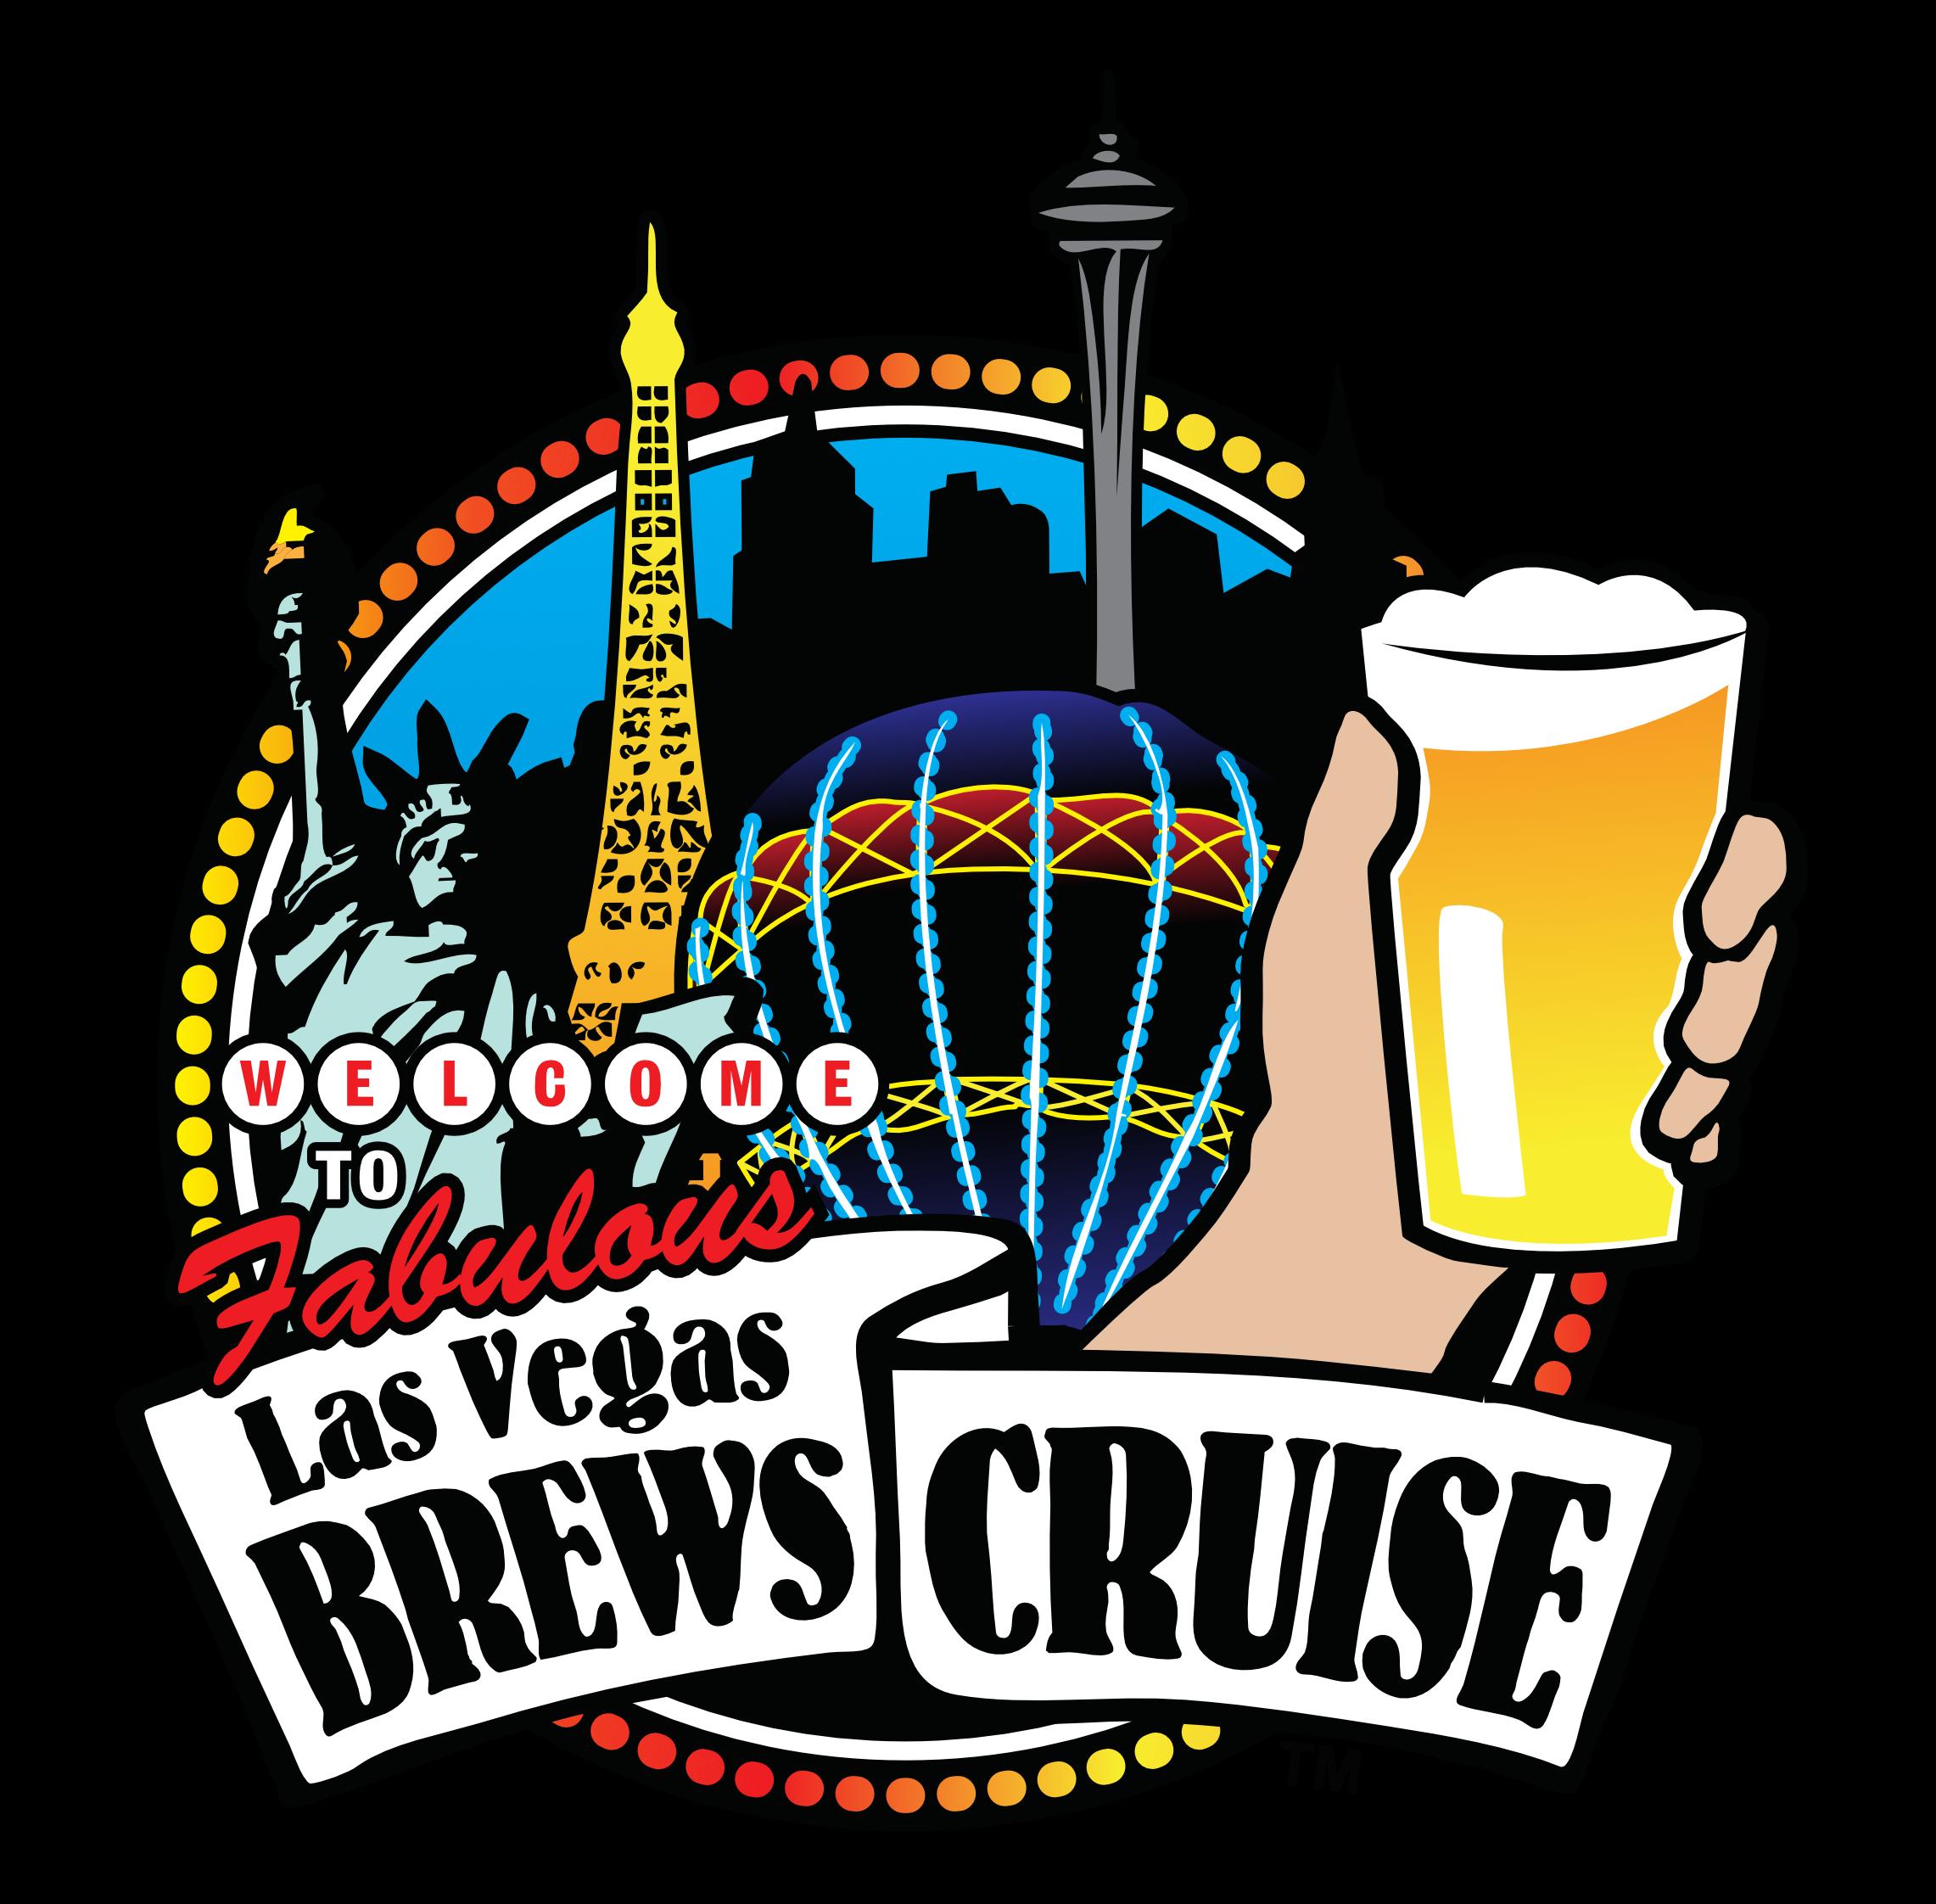 Las Vegas Brews Cruise